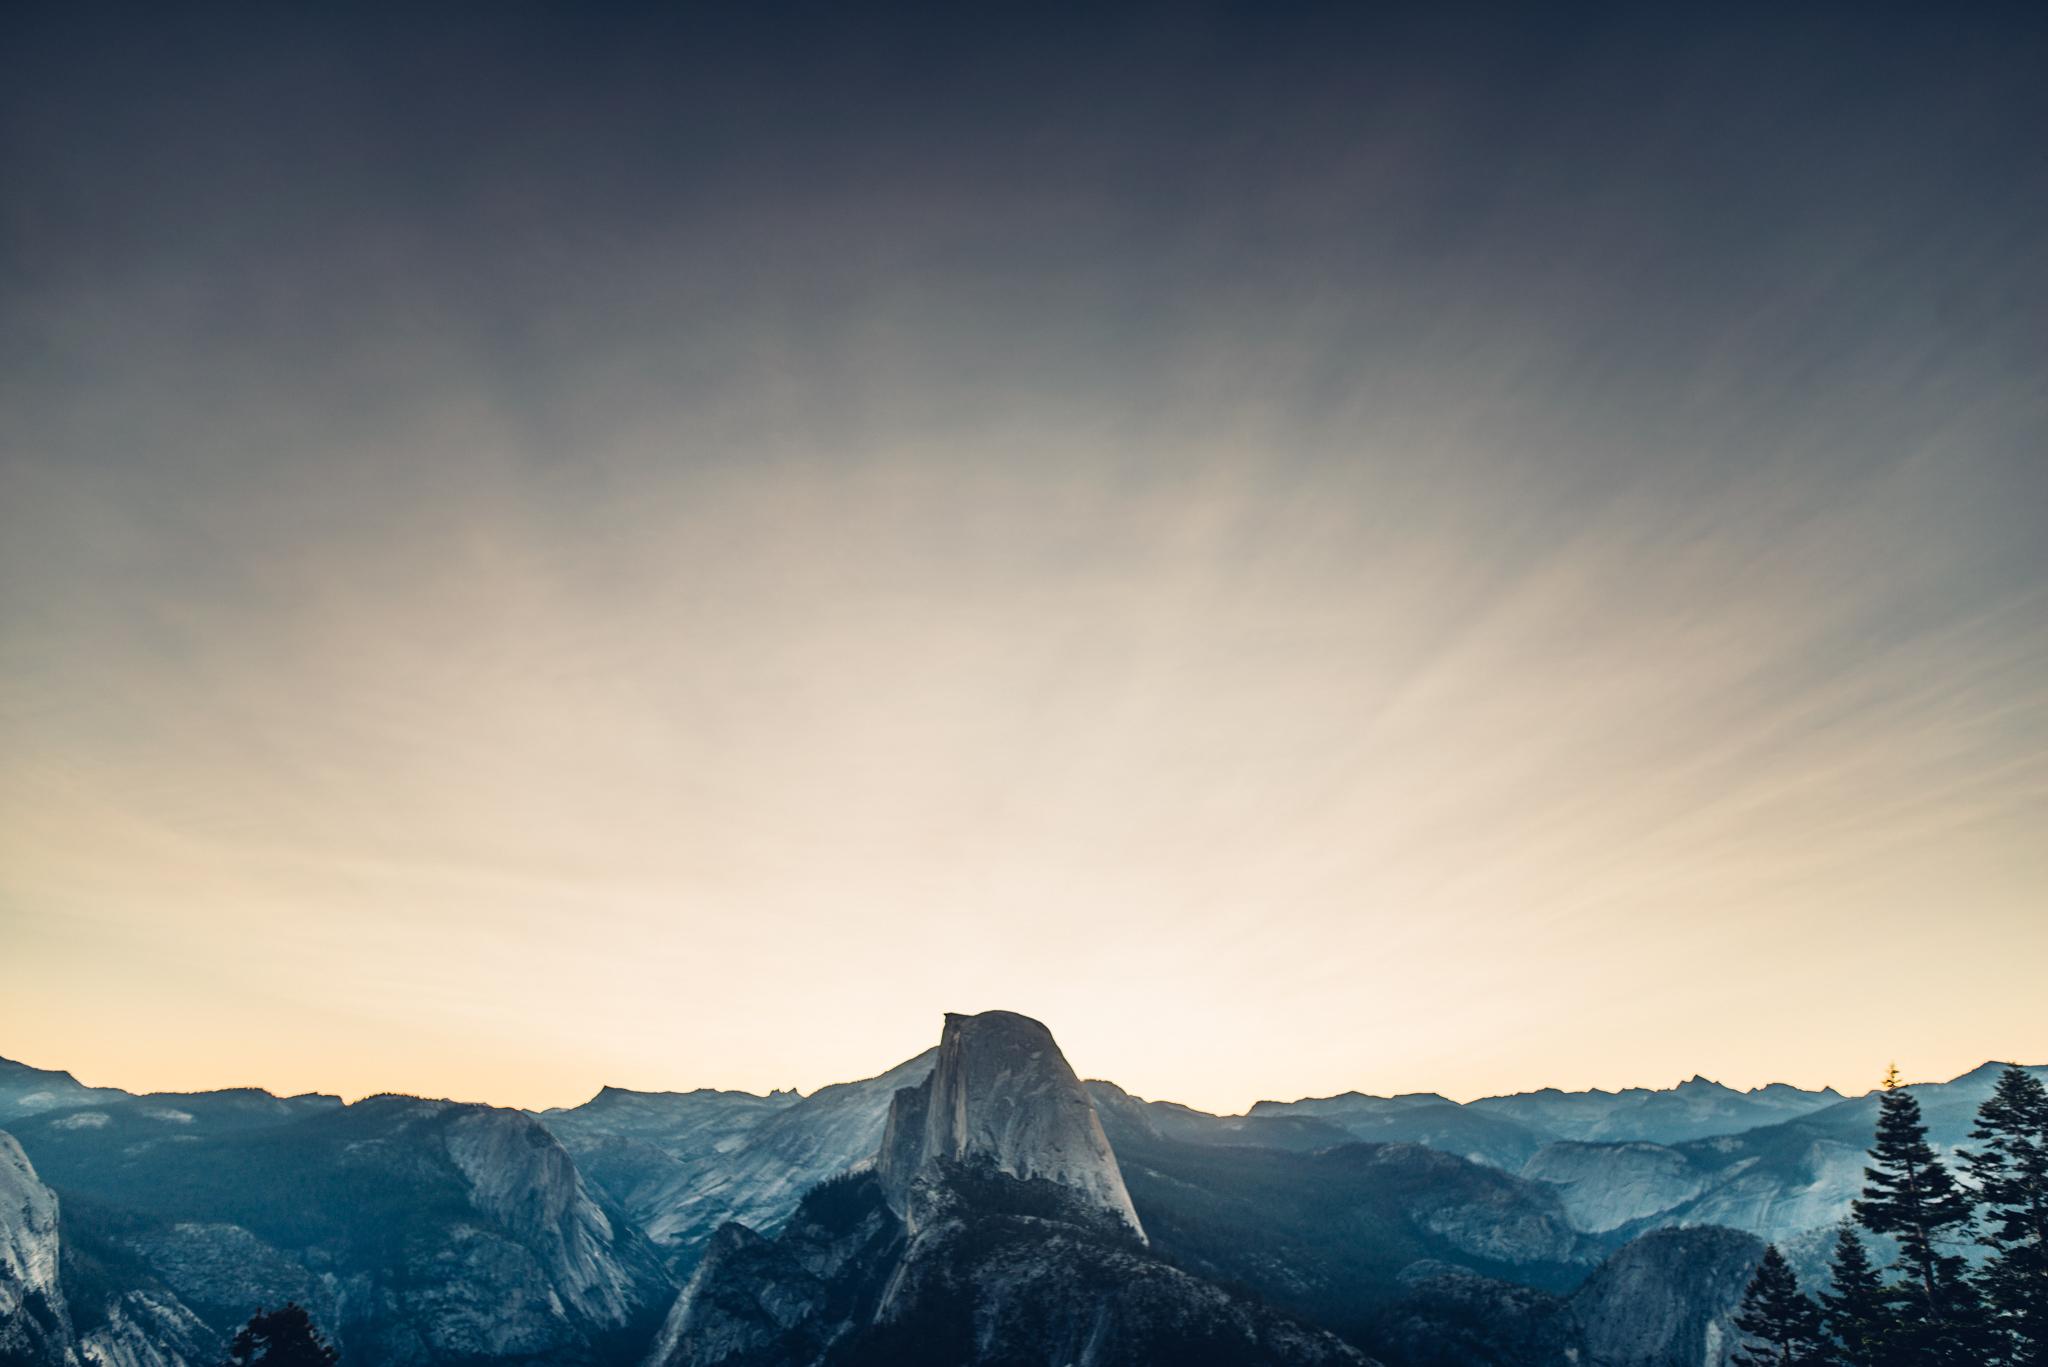 ©Isaiah & Taylor Photography - Los Angeles Destination Wedding Photographer - Yosemite National Park Hiking Adventure Engagement - Glacier Point Sunrise-001.jpg